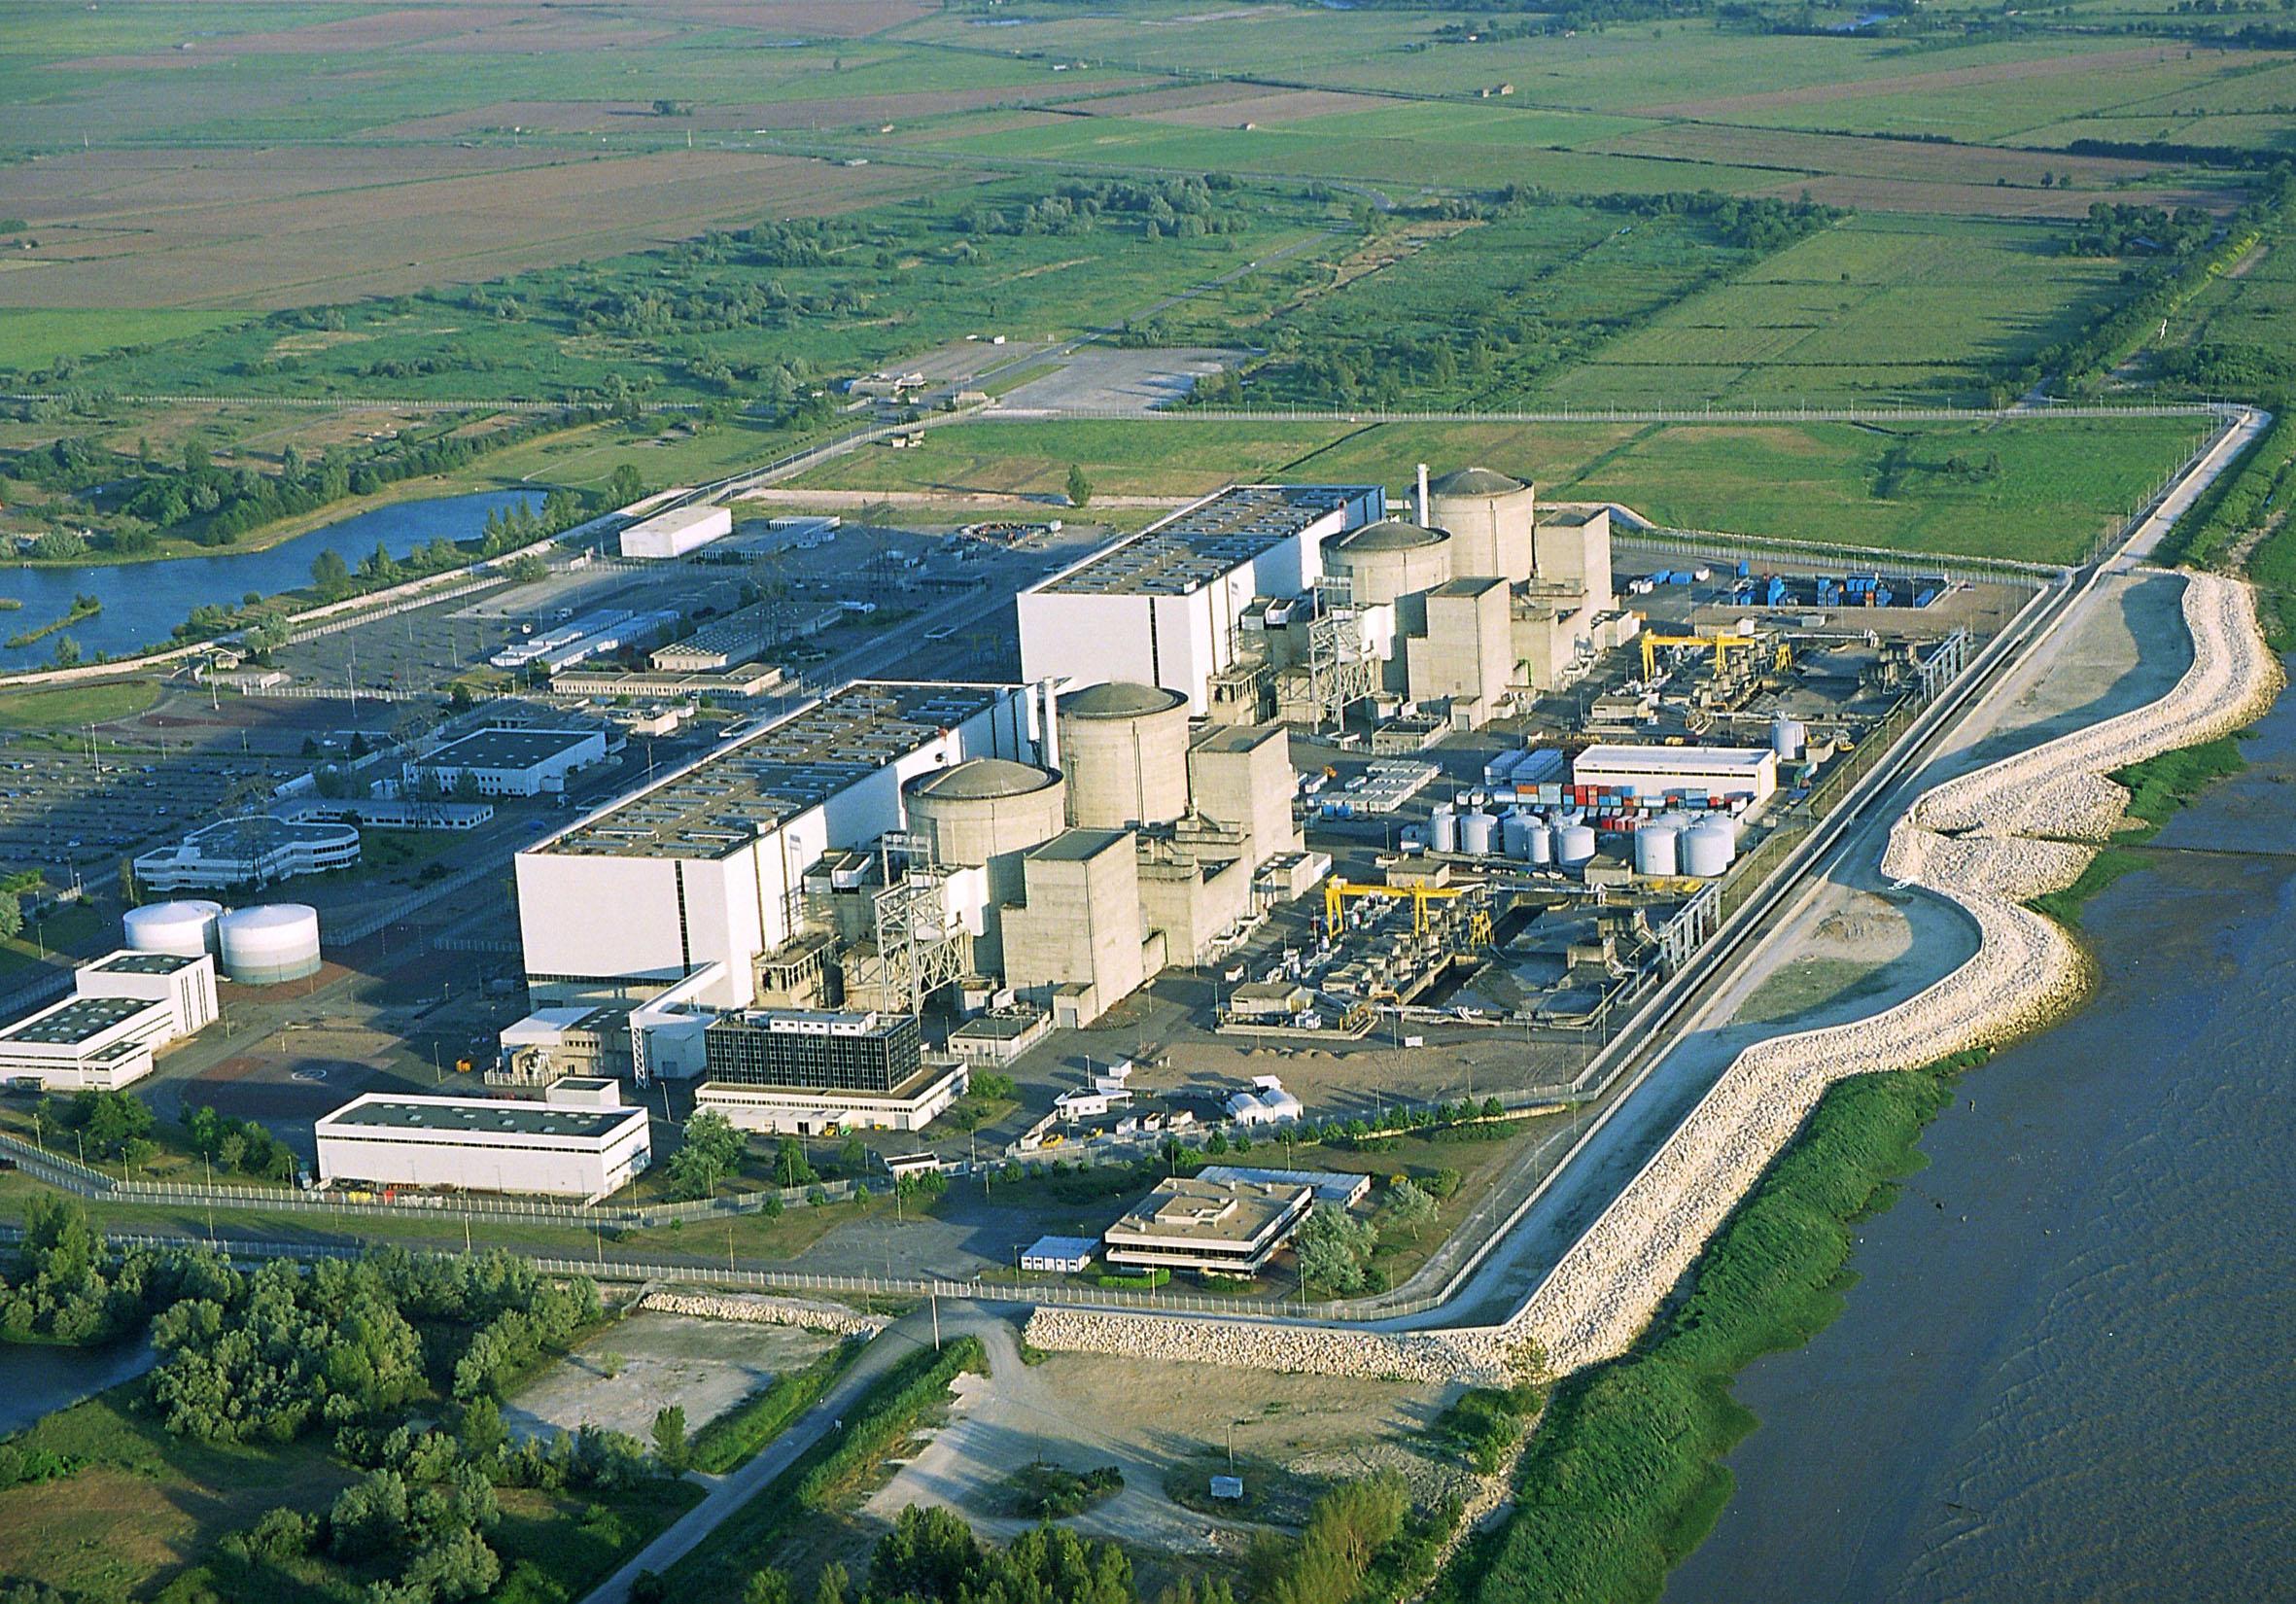 GDES, responsable del mantenimiento de superficies del 21% del parque nuclear de Francia